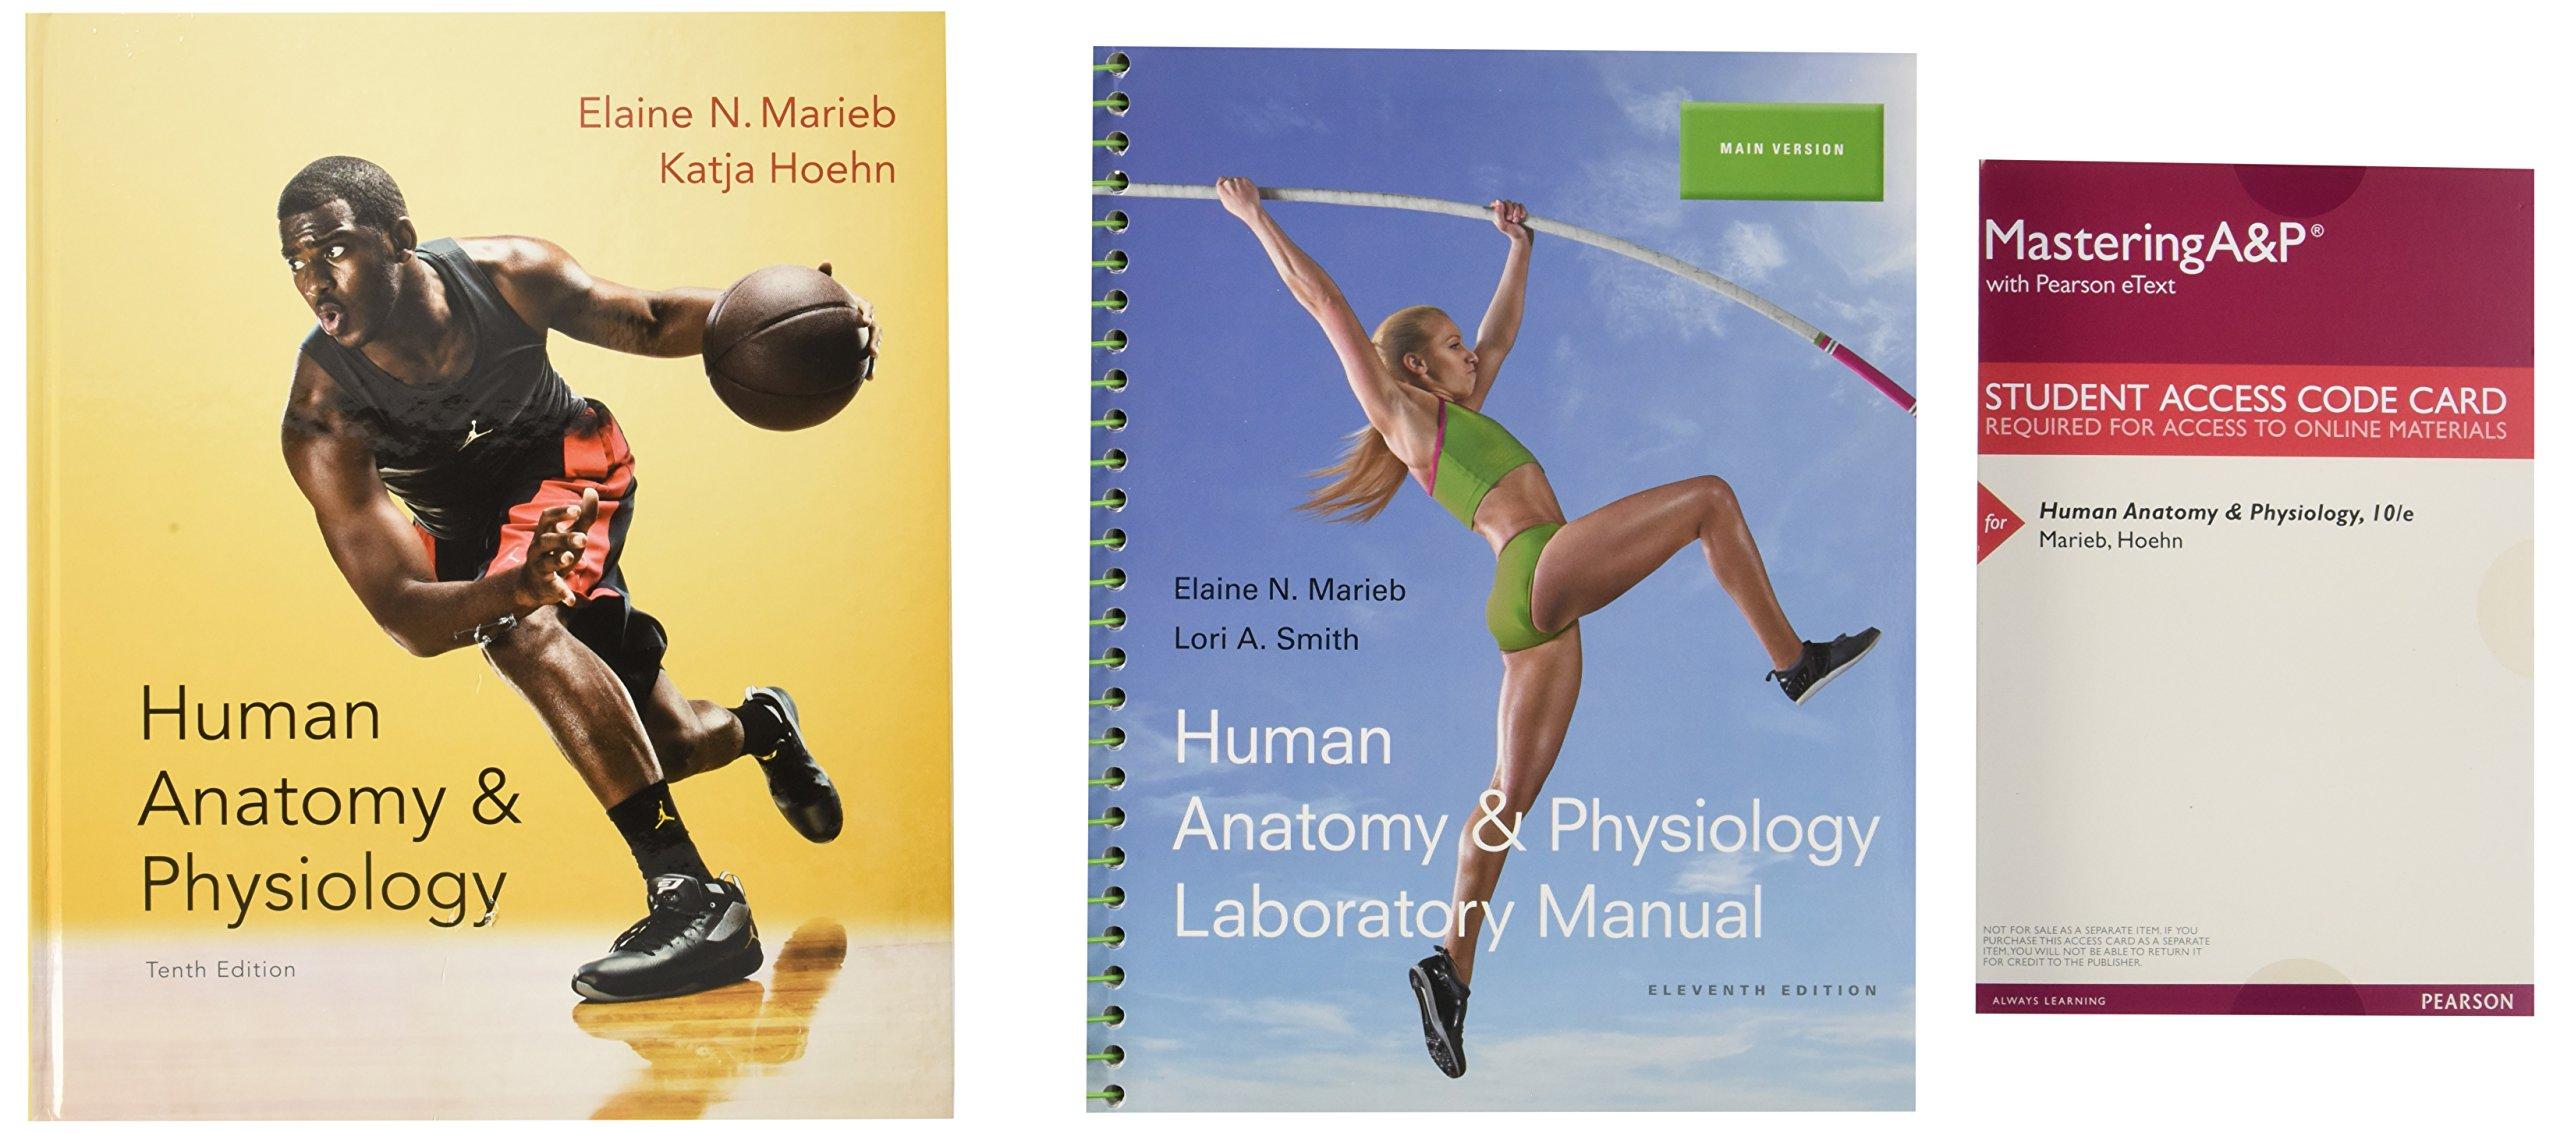 Human Anatomy & Physiology; Human Anatomy & Physiology Laboratory ...